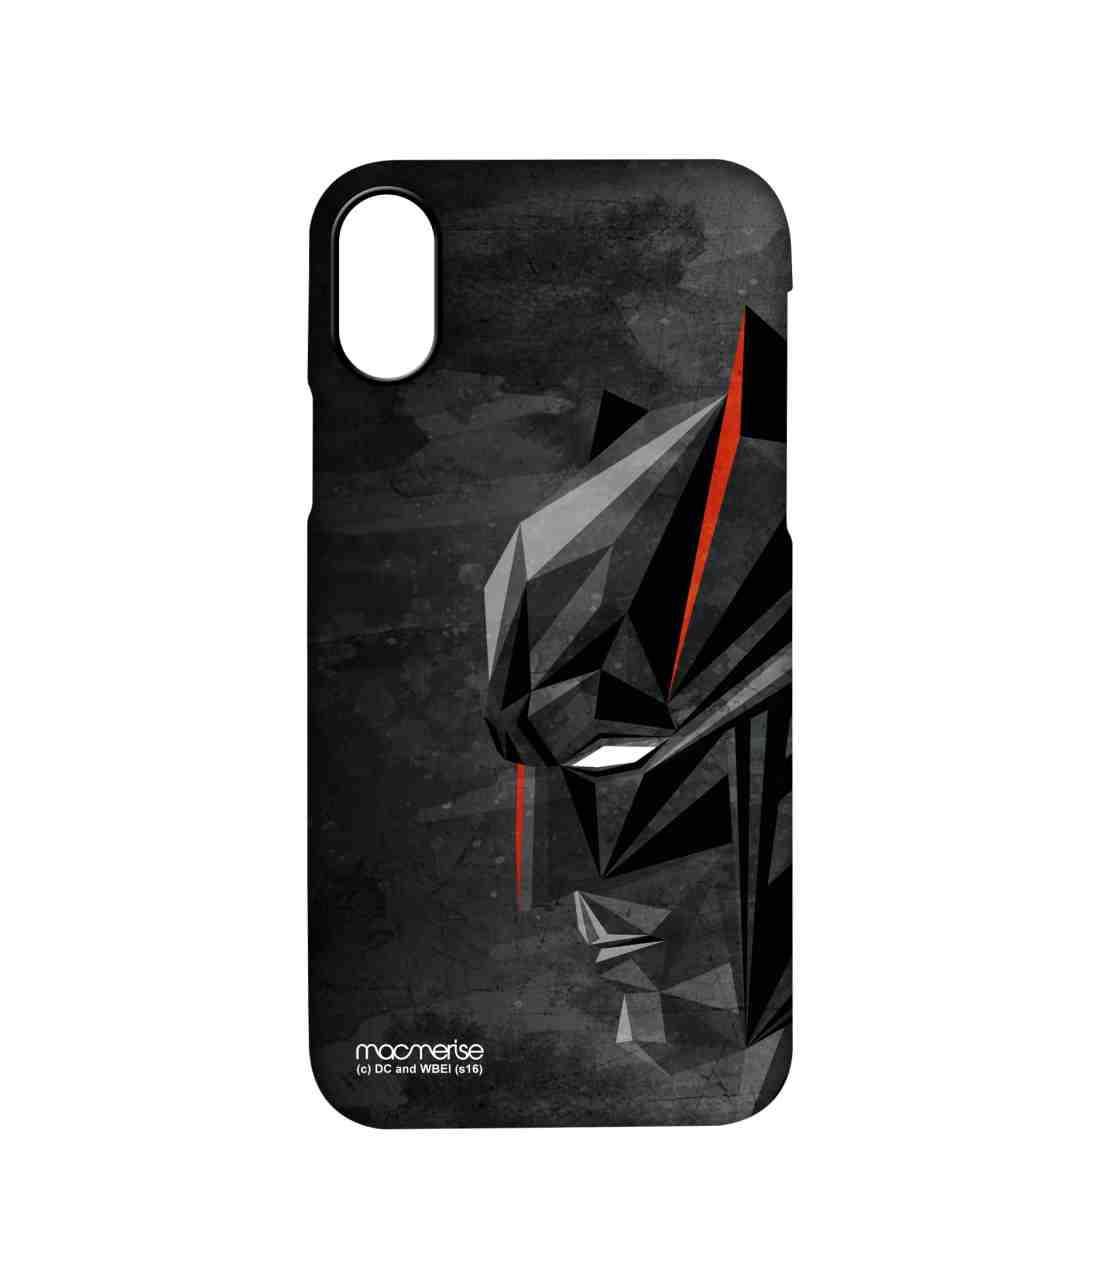 Best Apple iPhone X Mobile Covers - Buy Apple iPhone X Batman ...